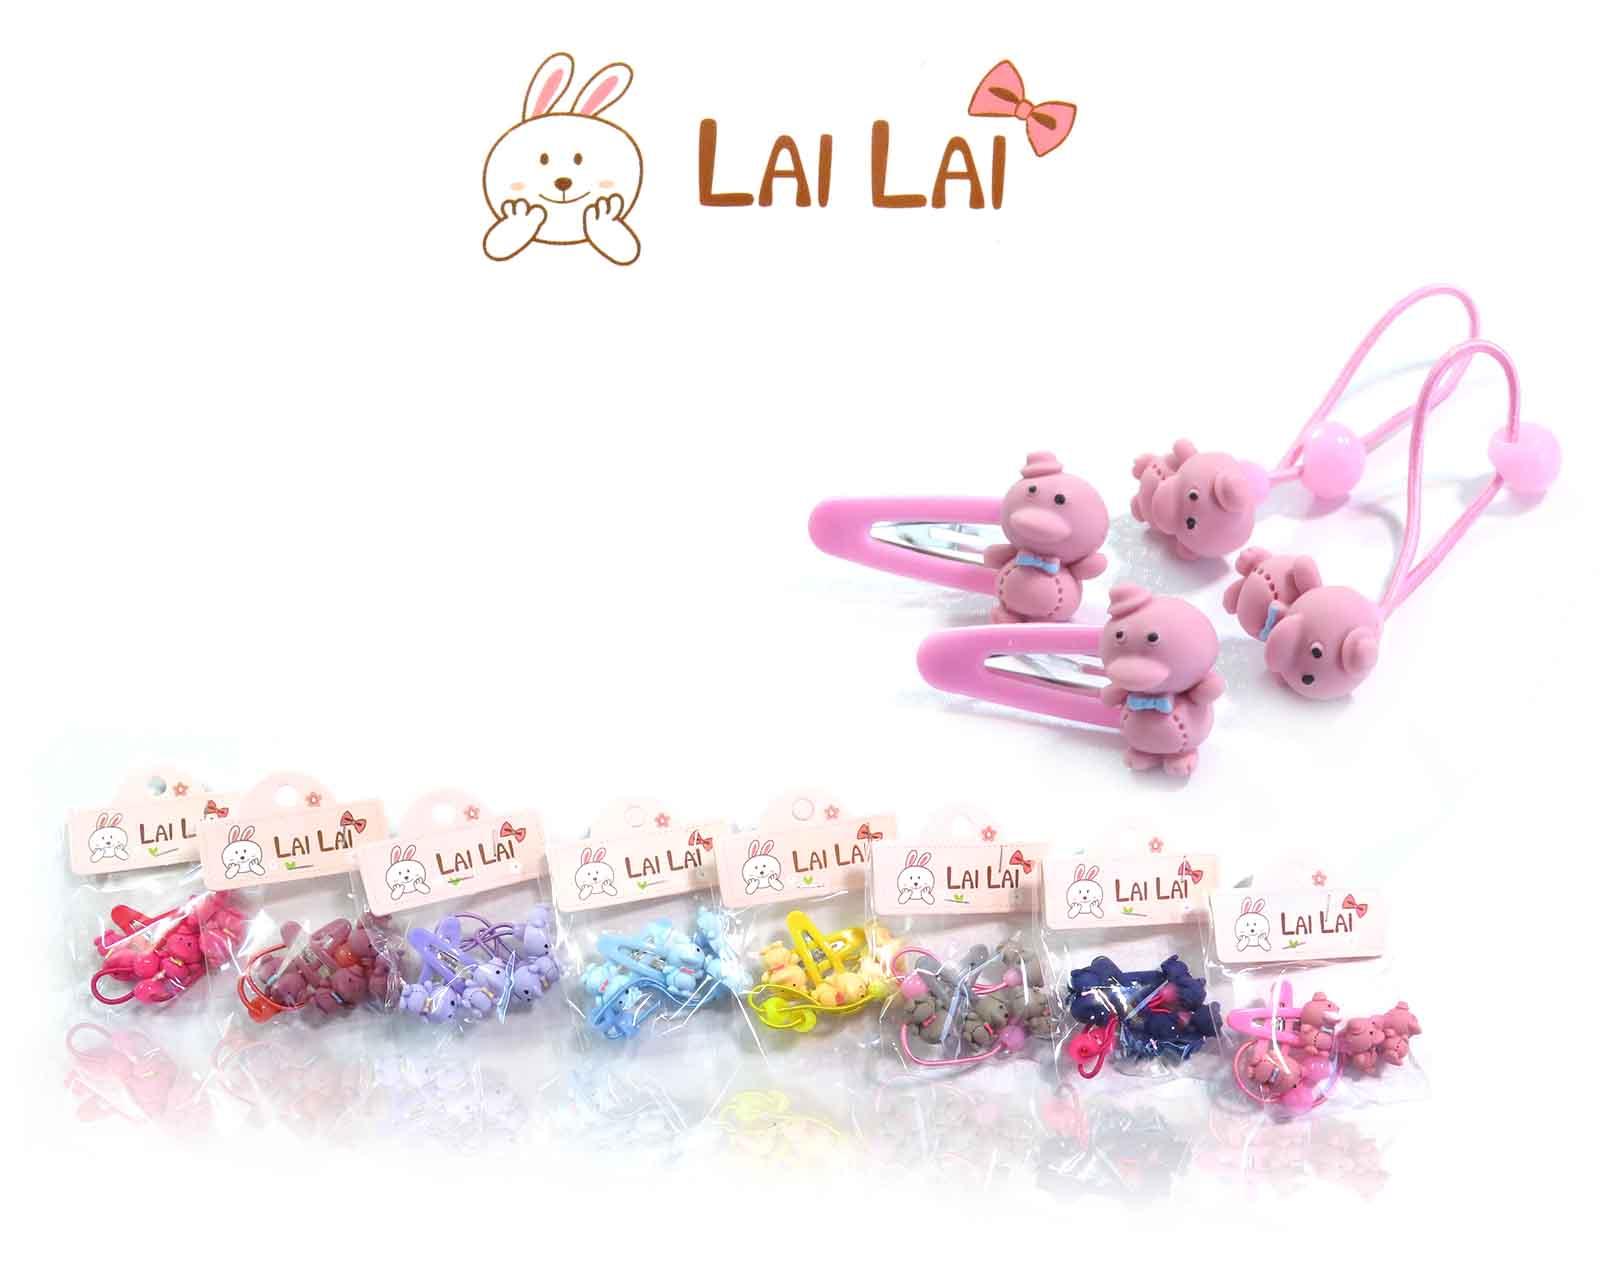 پکیج کش و گیره مو بچگانه LAI LAI